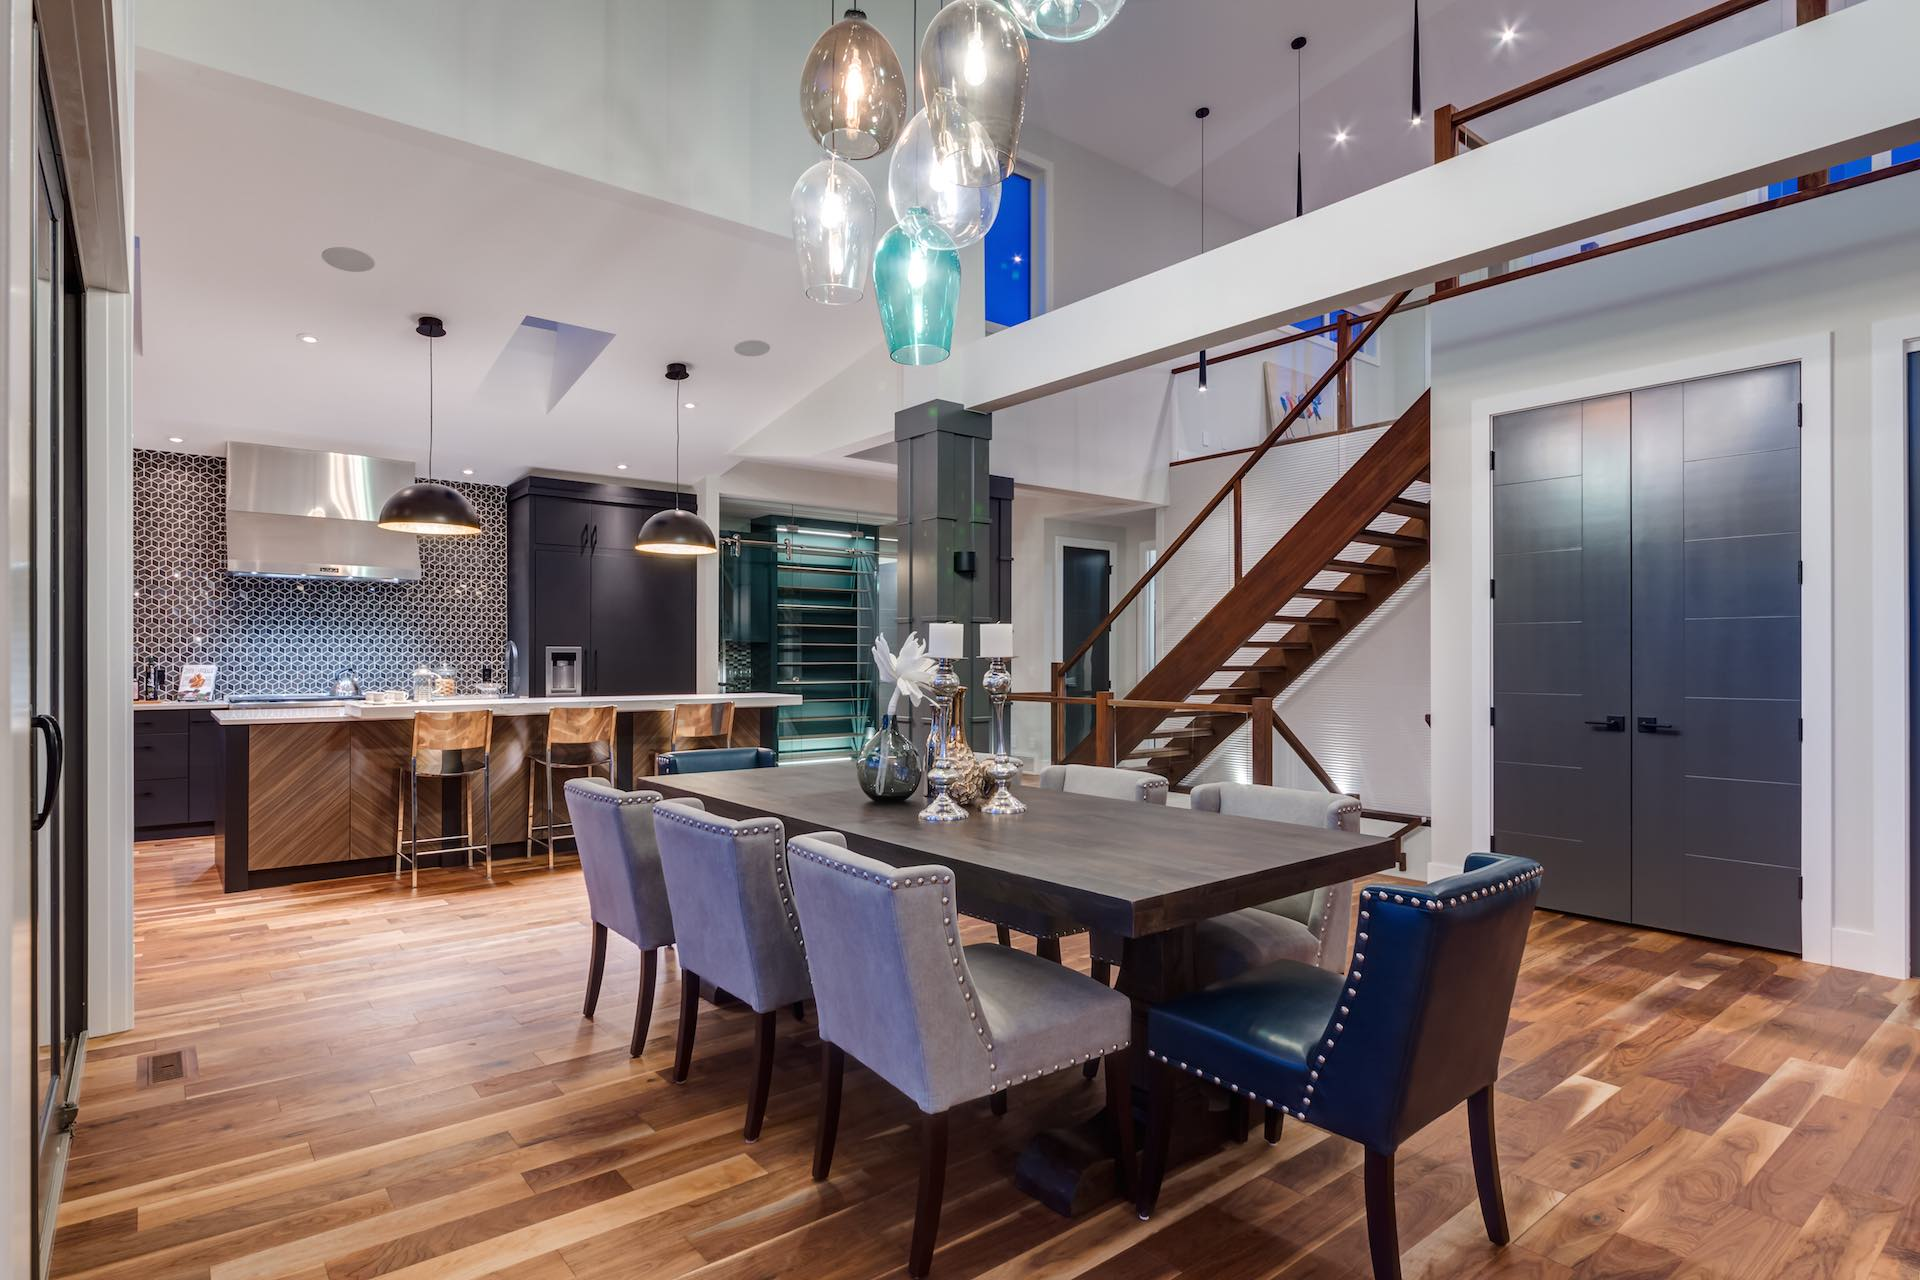 Calgary Luxury Renovations - Silverhorn 10 Kitchen